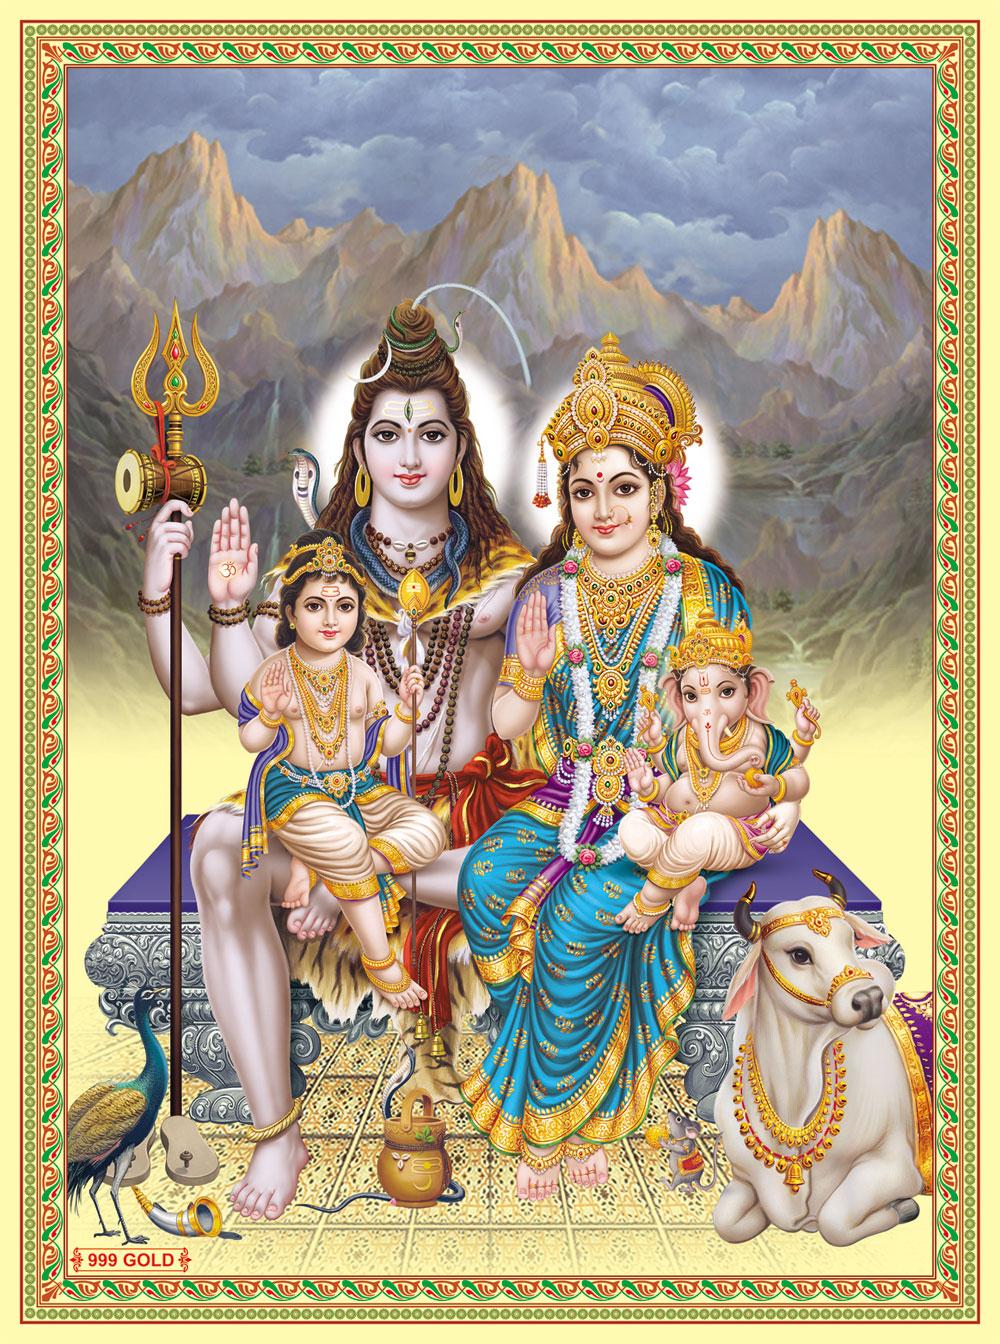 Lord Shiva Black Hd Wallpapers Download Shiv Parivar Wallpaper Free Download Gallery